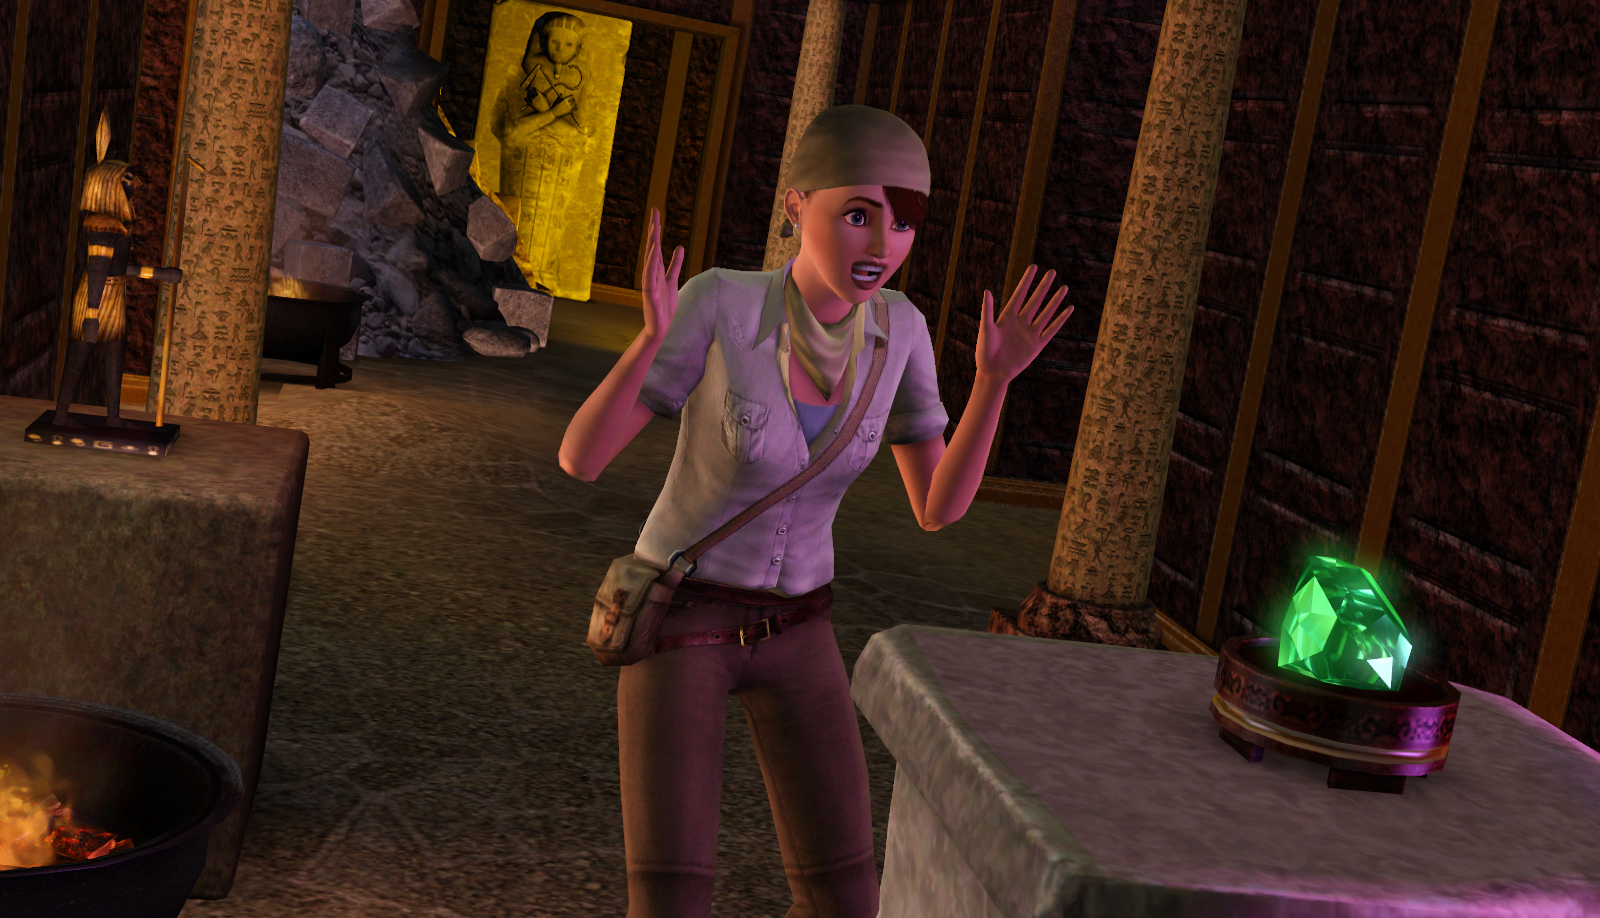 Les Sims 3: Destination Aventure (Win - Mac) - Image 6